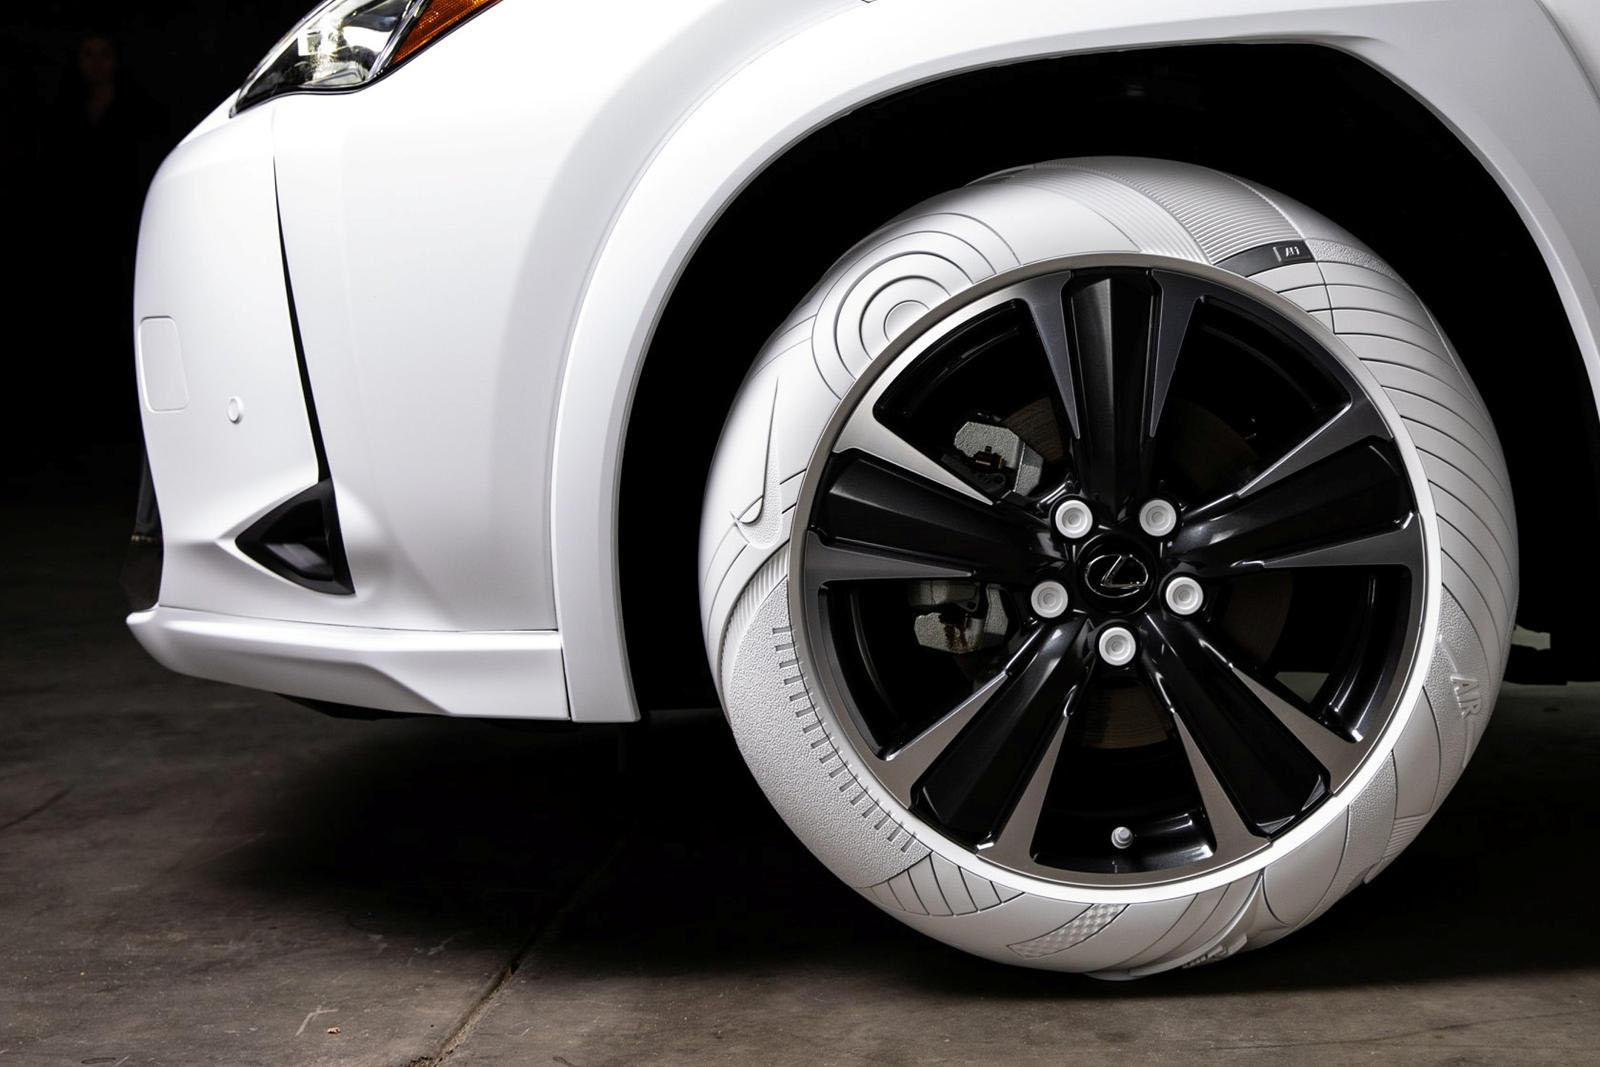 Lexus Sole of the UX